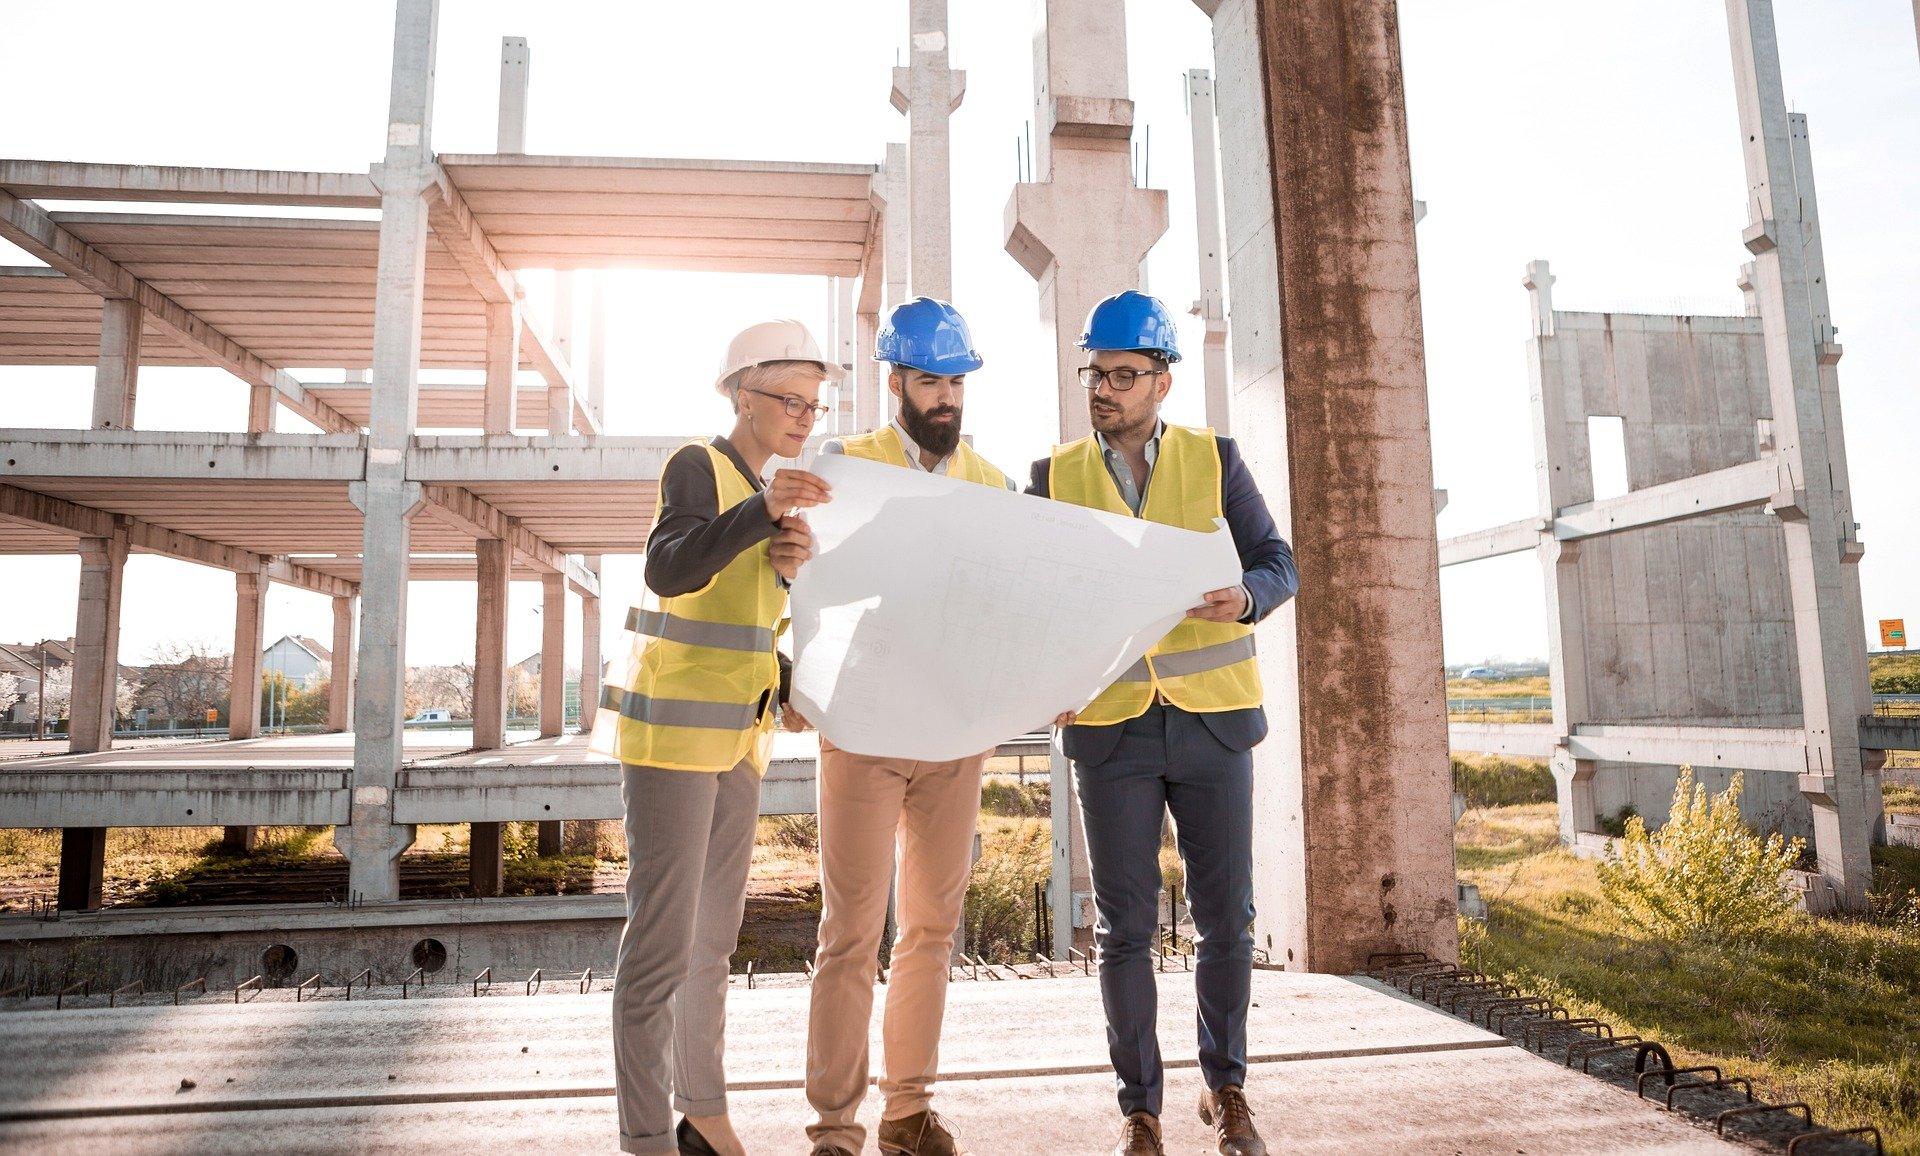 heidenheim an der brenz Baustellenüberwachung, Baustellenbewachung Sicherheitsdienst Baustelle, Bau bewachen